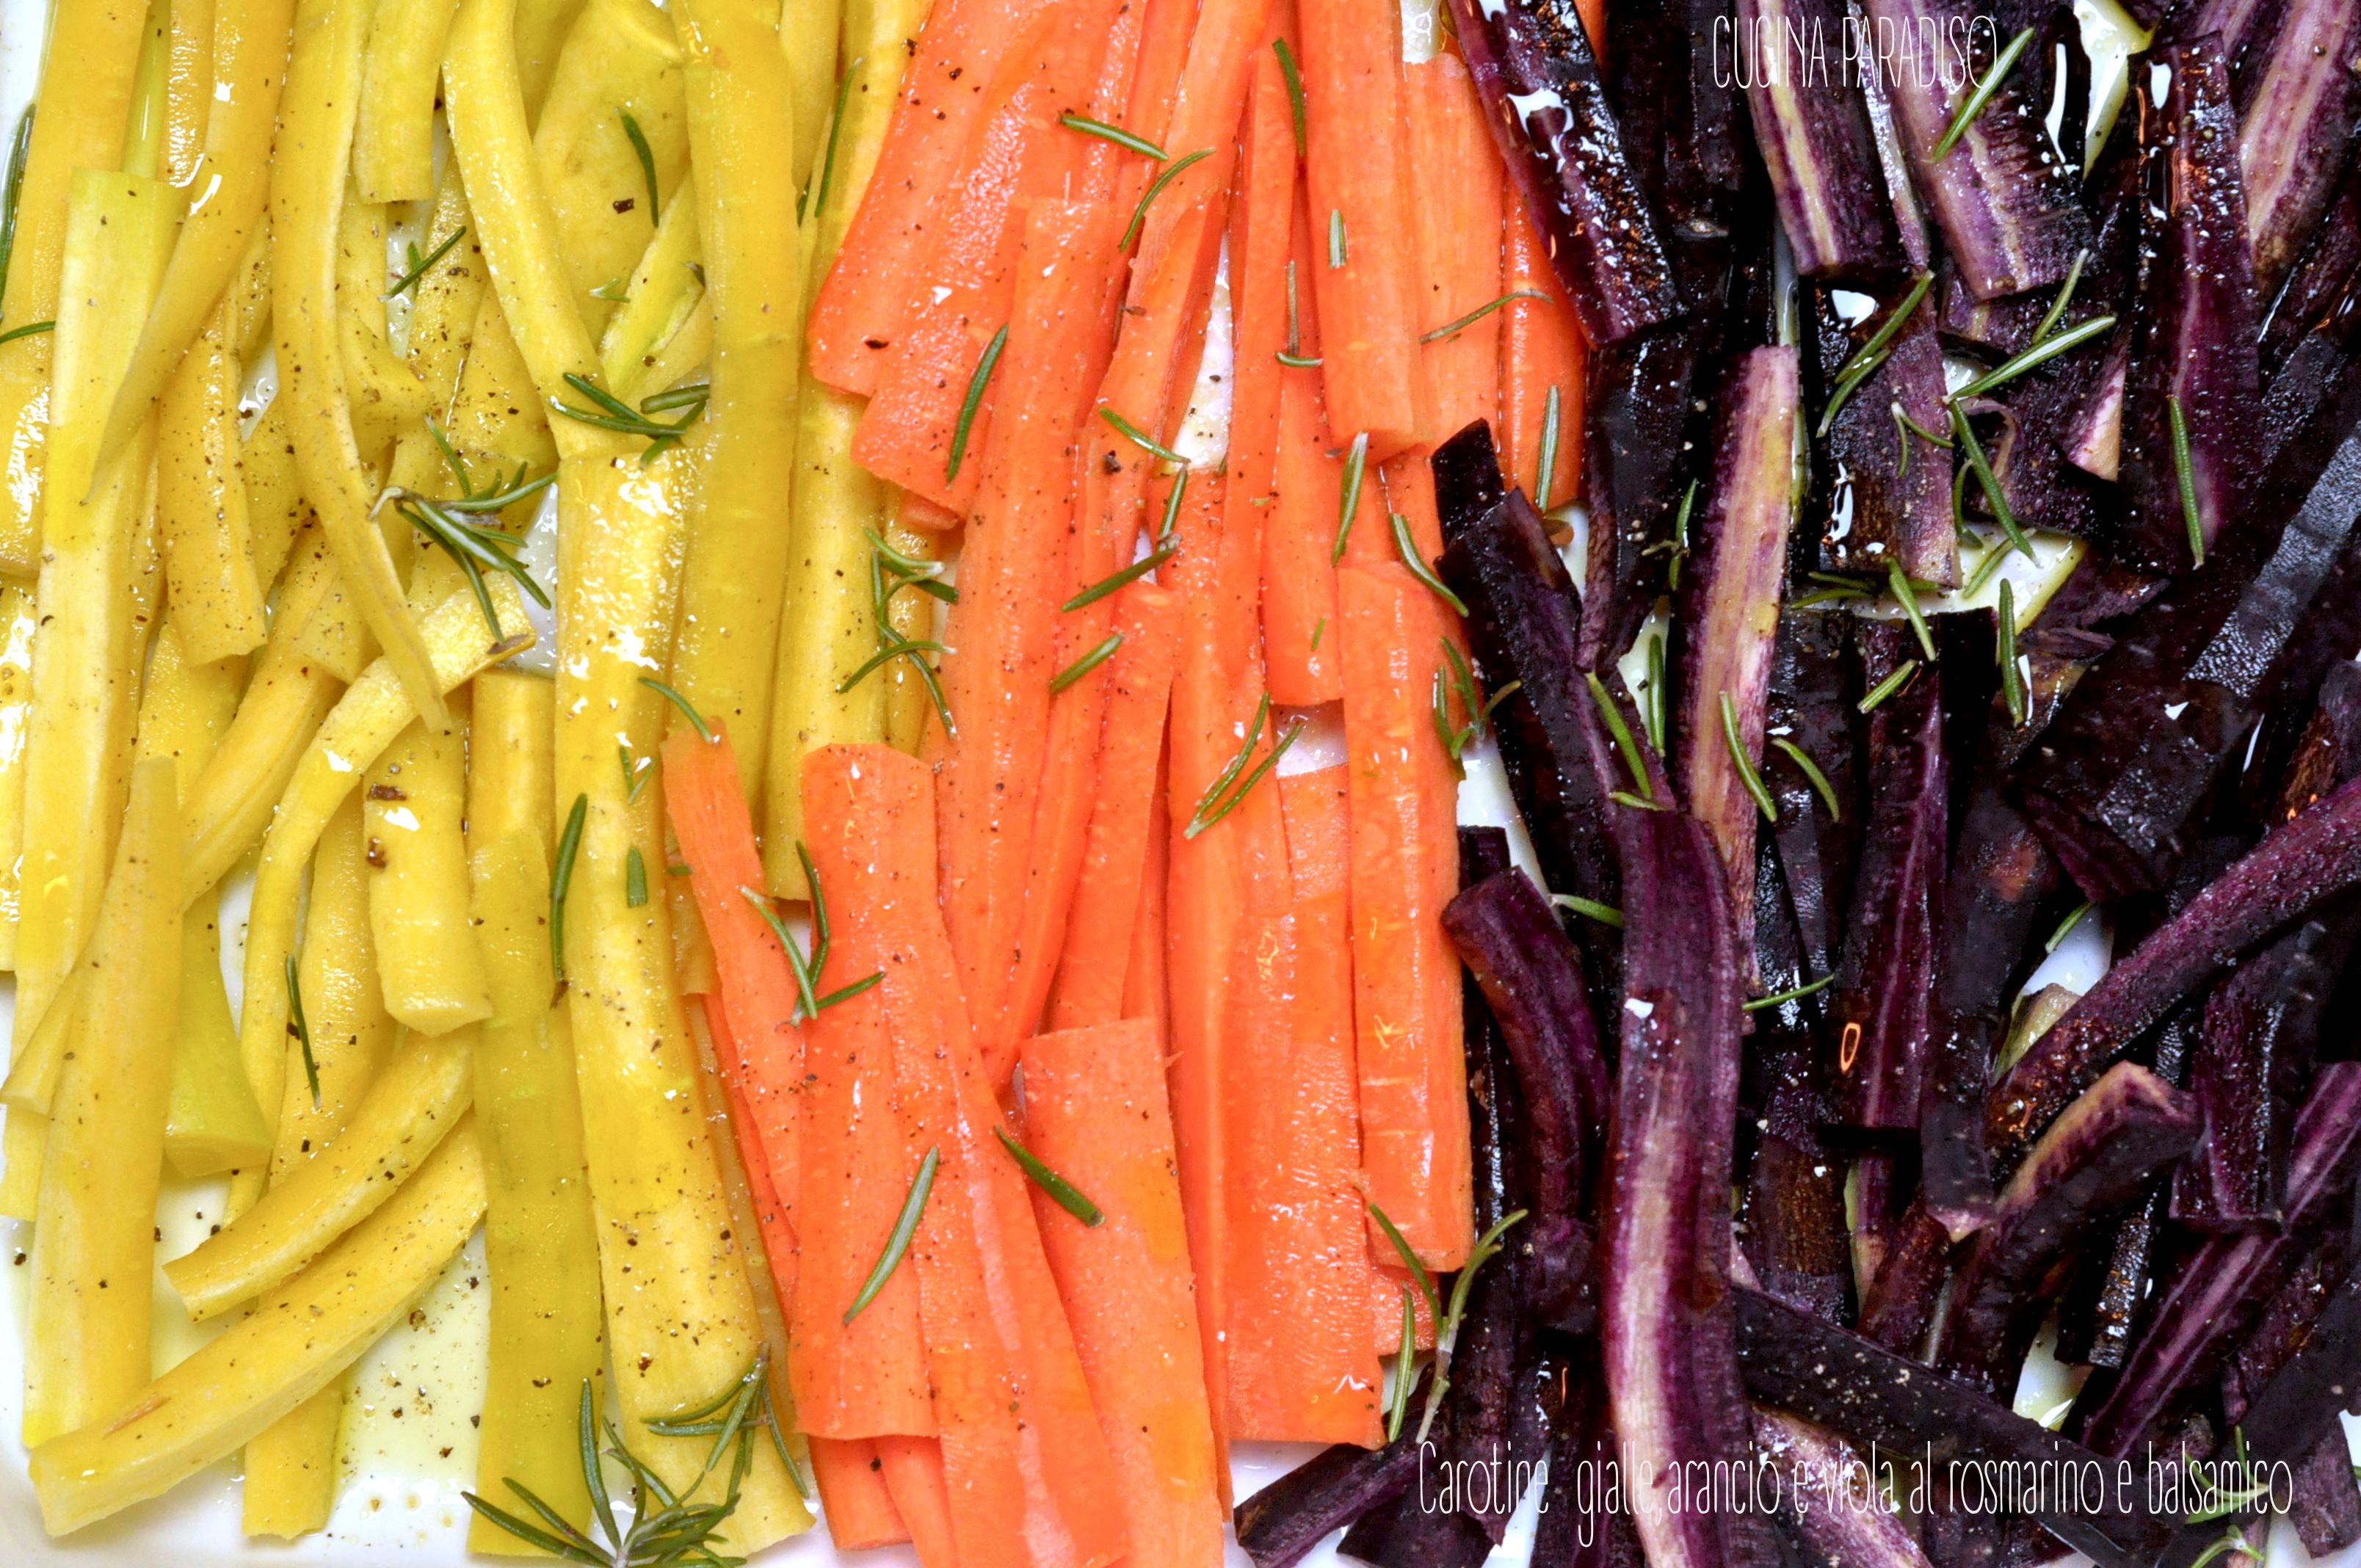 Carotine  gialle,arancio e viola al rosmarino e balsamico3